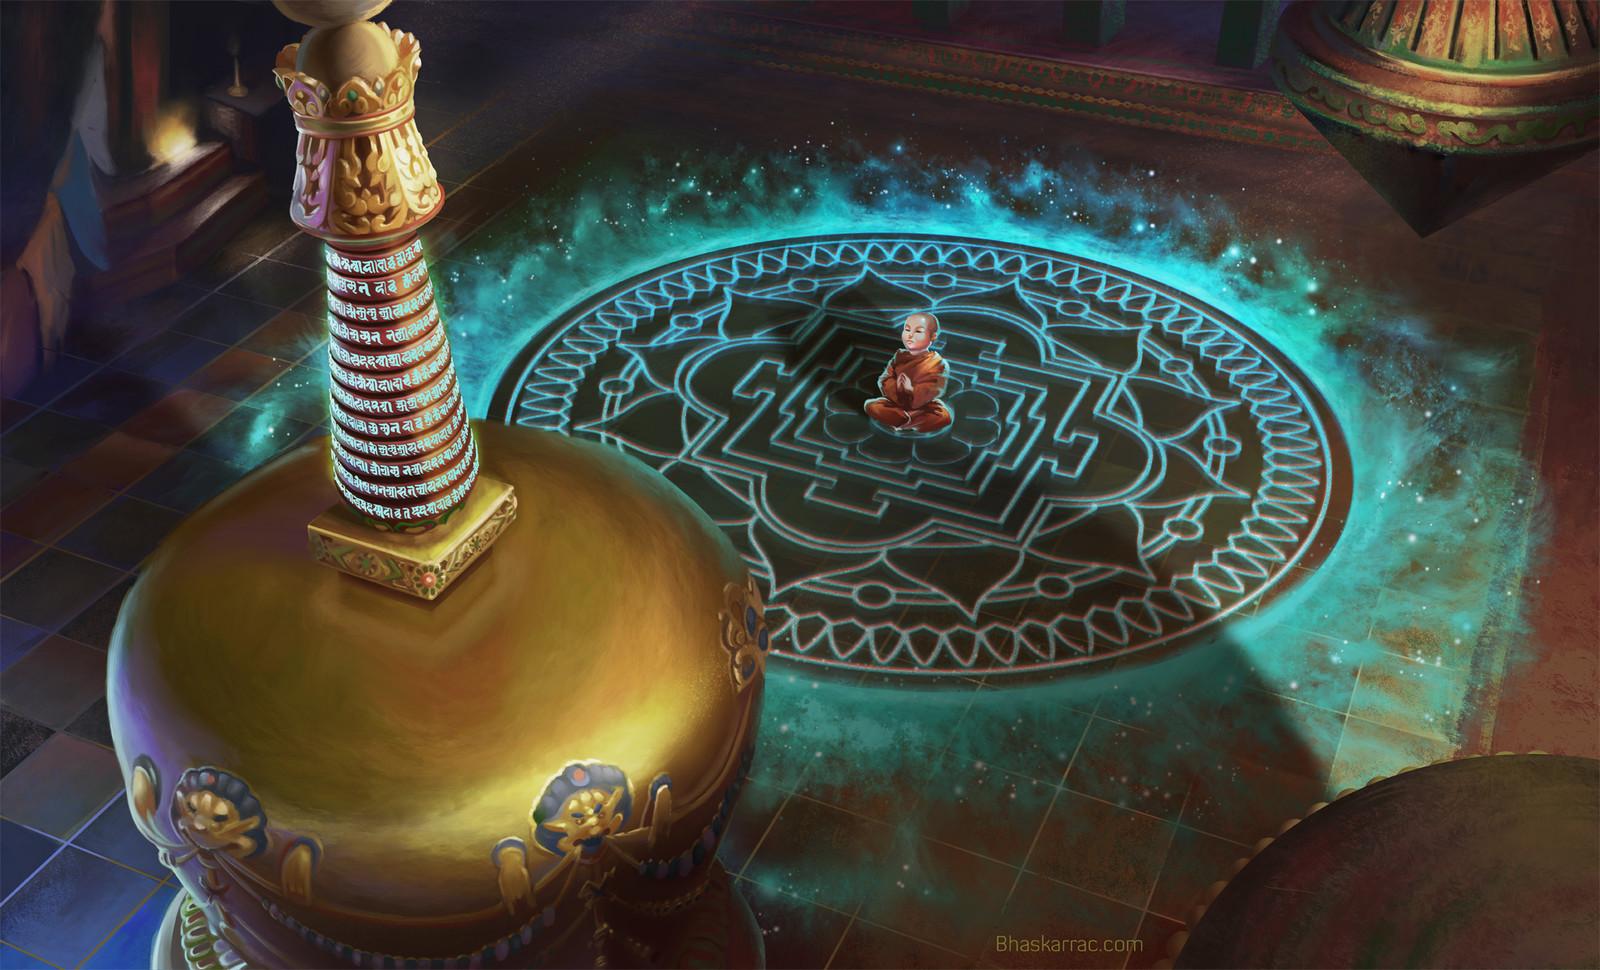 Mandala (The Universe)